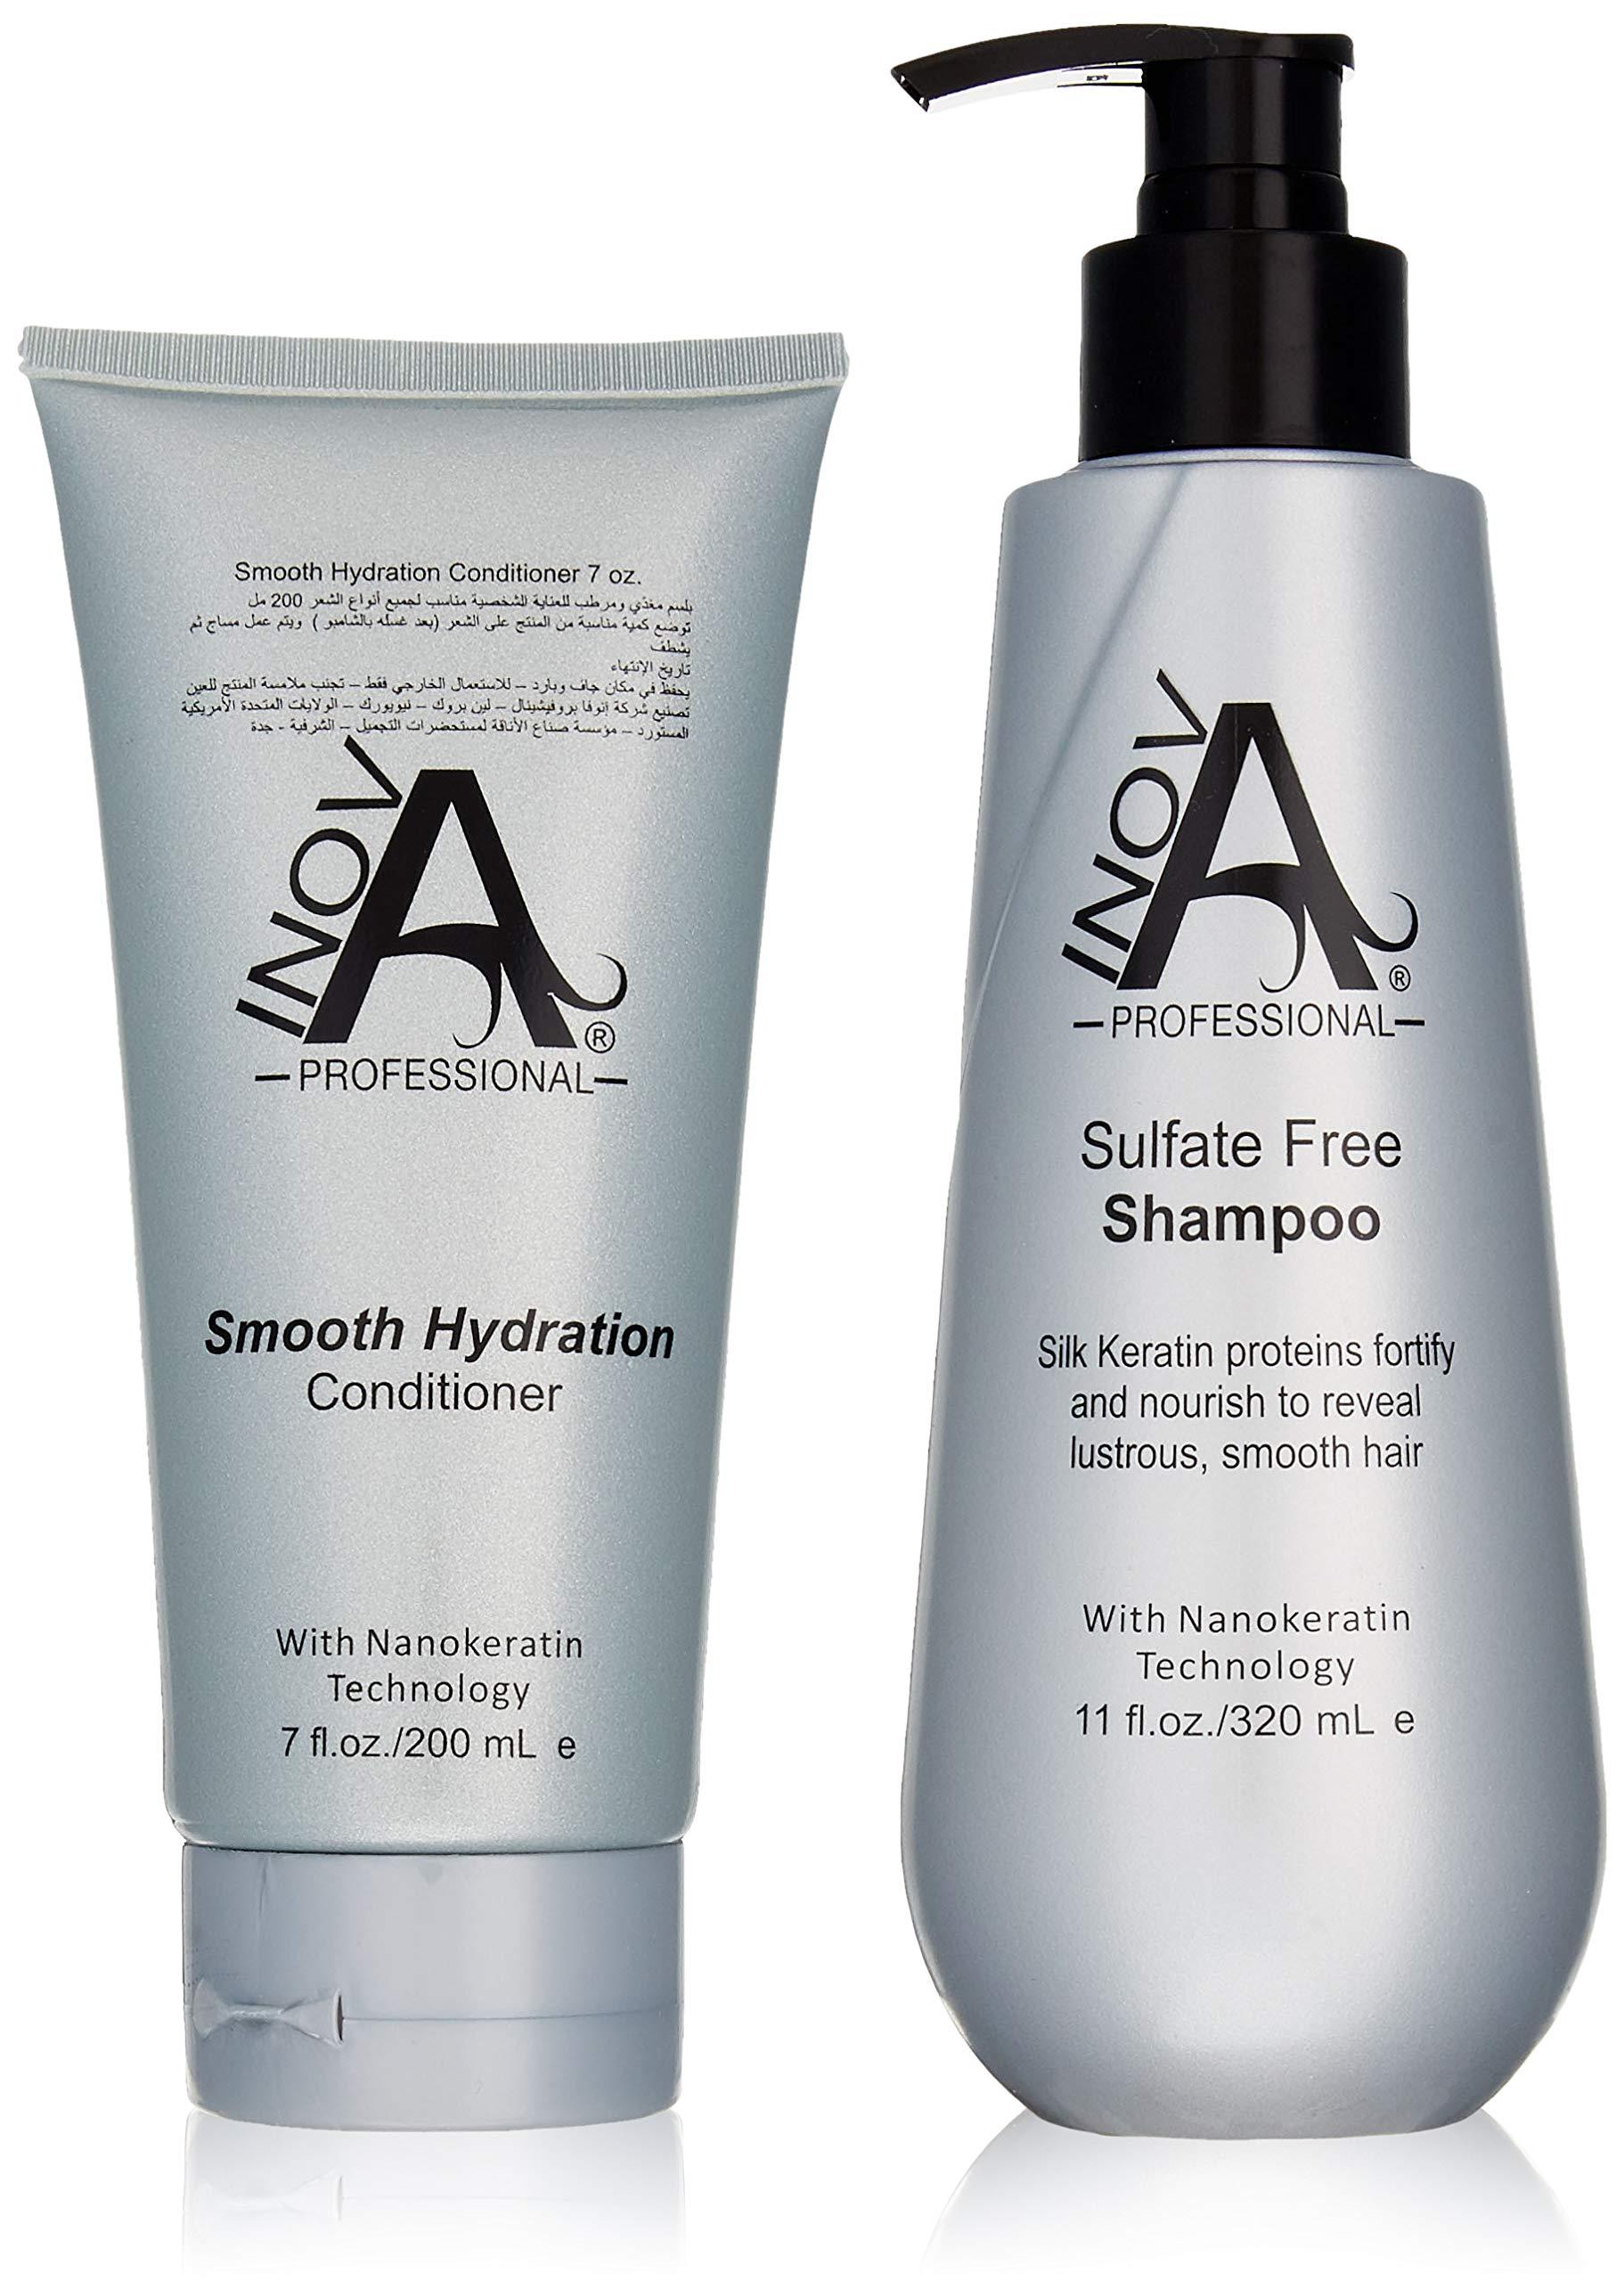 Inova Professional Silk Keratin Shampoo & Conditioner Set - Smooth Protection Sulfate-Free Shampoo & Smooth Hydration Conditioner, 11 Fluid Ounce & 7 Fluid Ounce by inova professional inovaprofessional